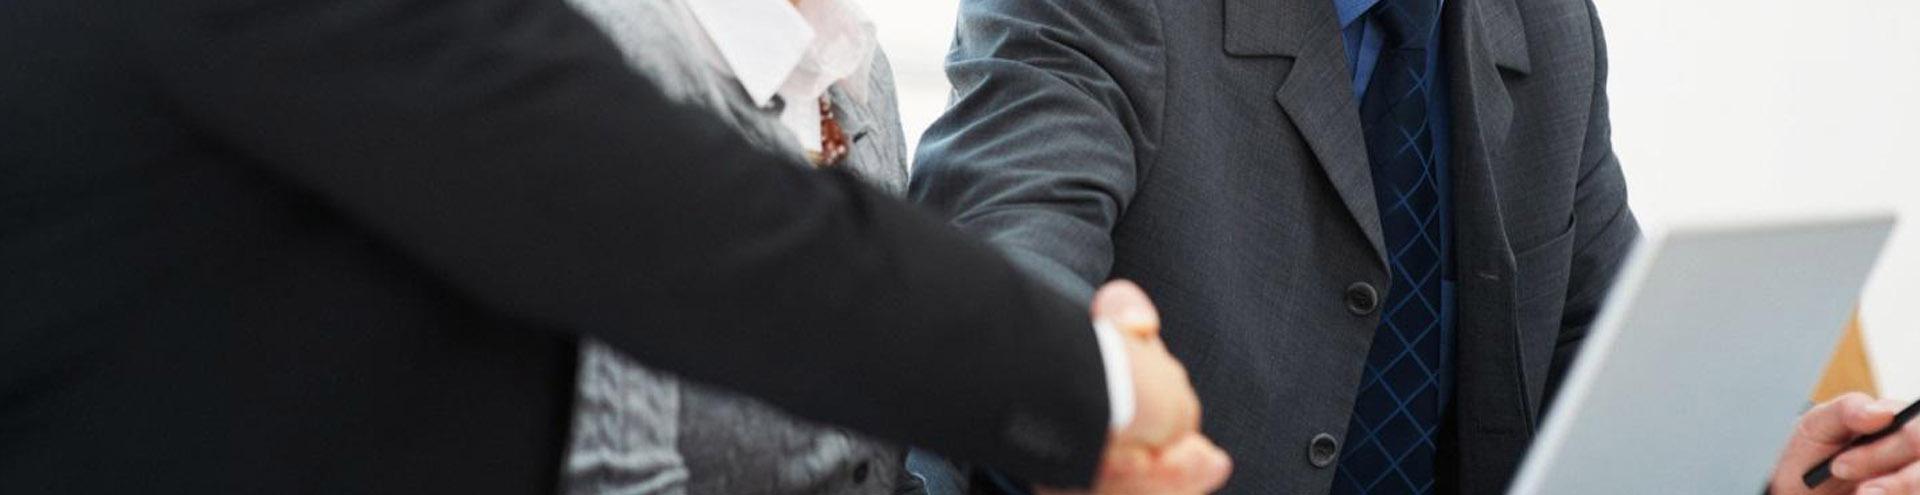 консультация юриста в Краснодаре